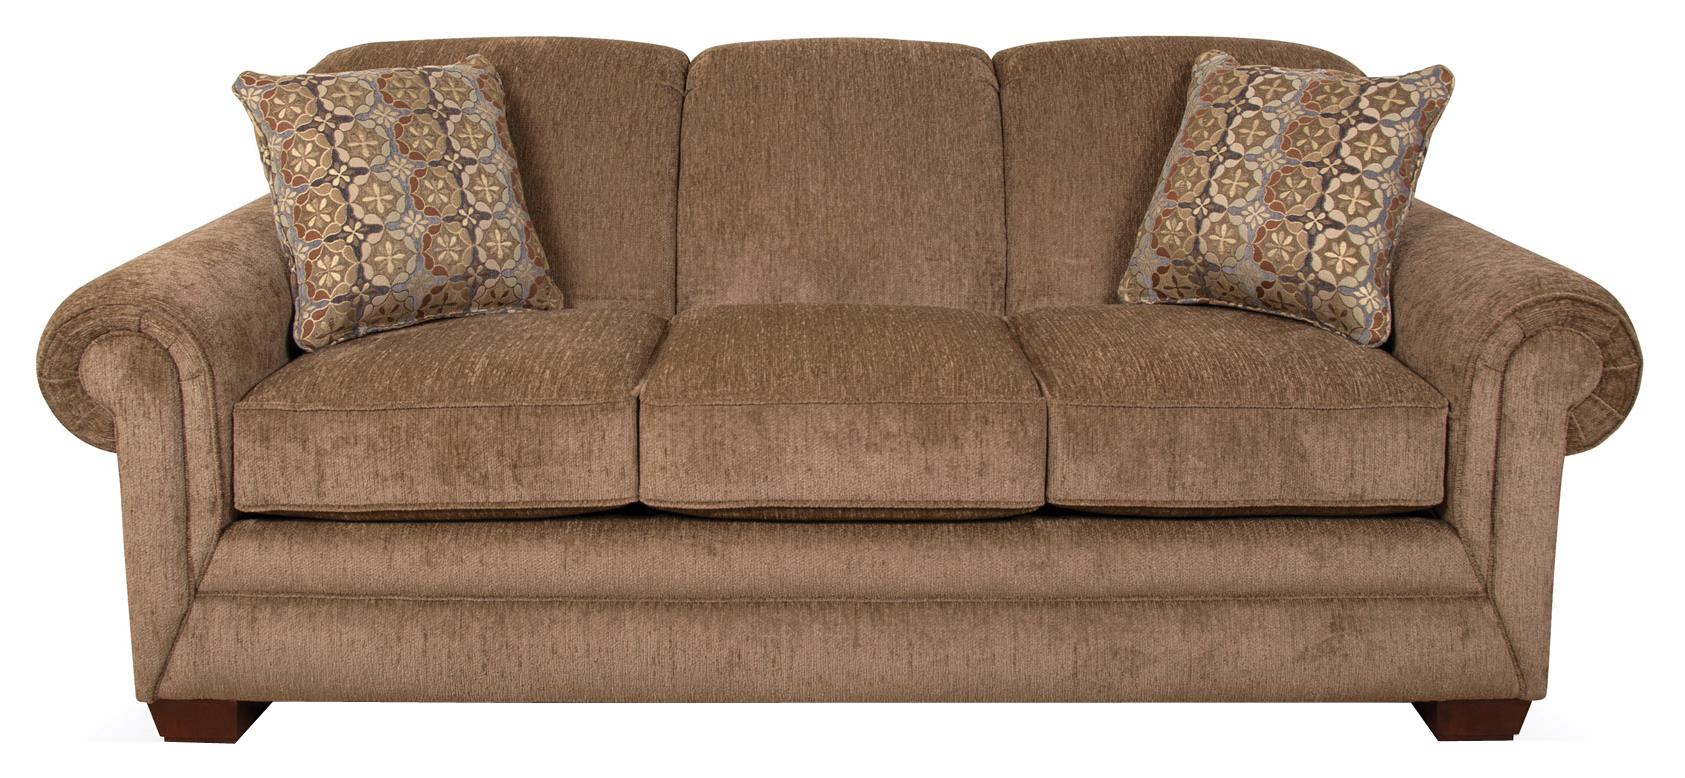 England Monroe Sofa - Item Number: 1435-6065